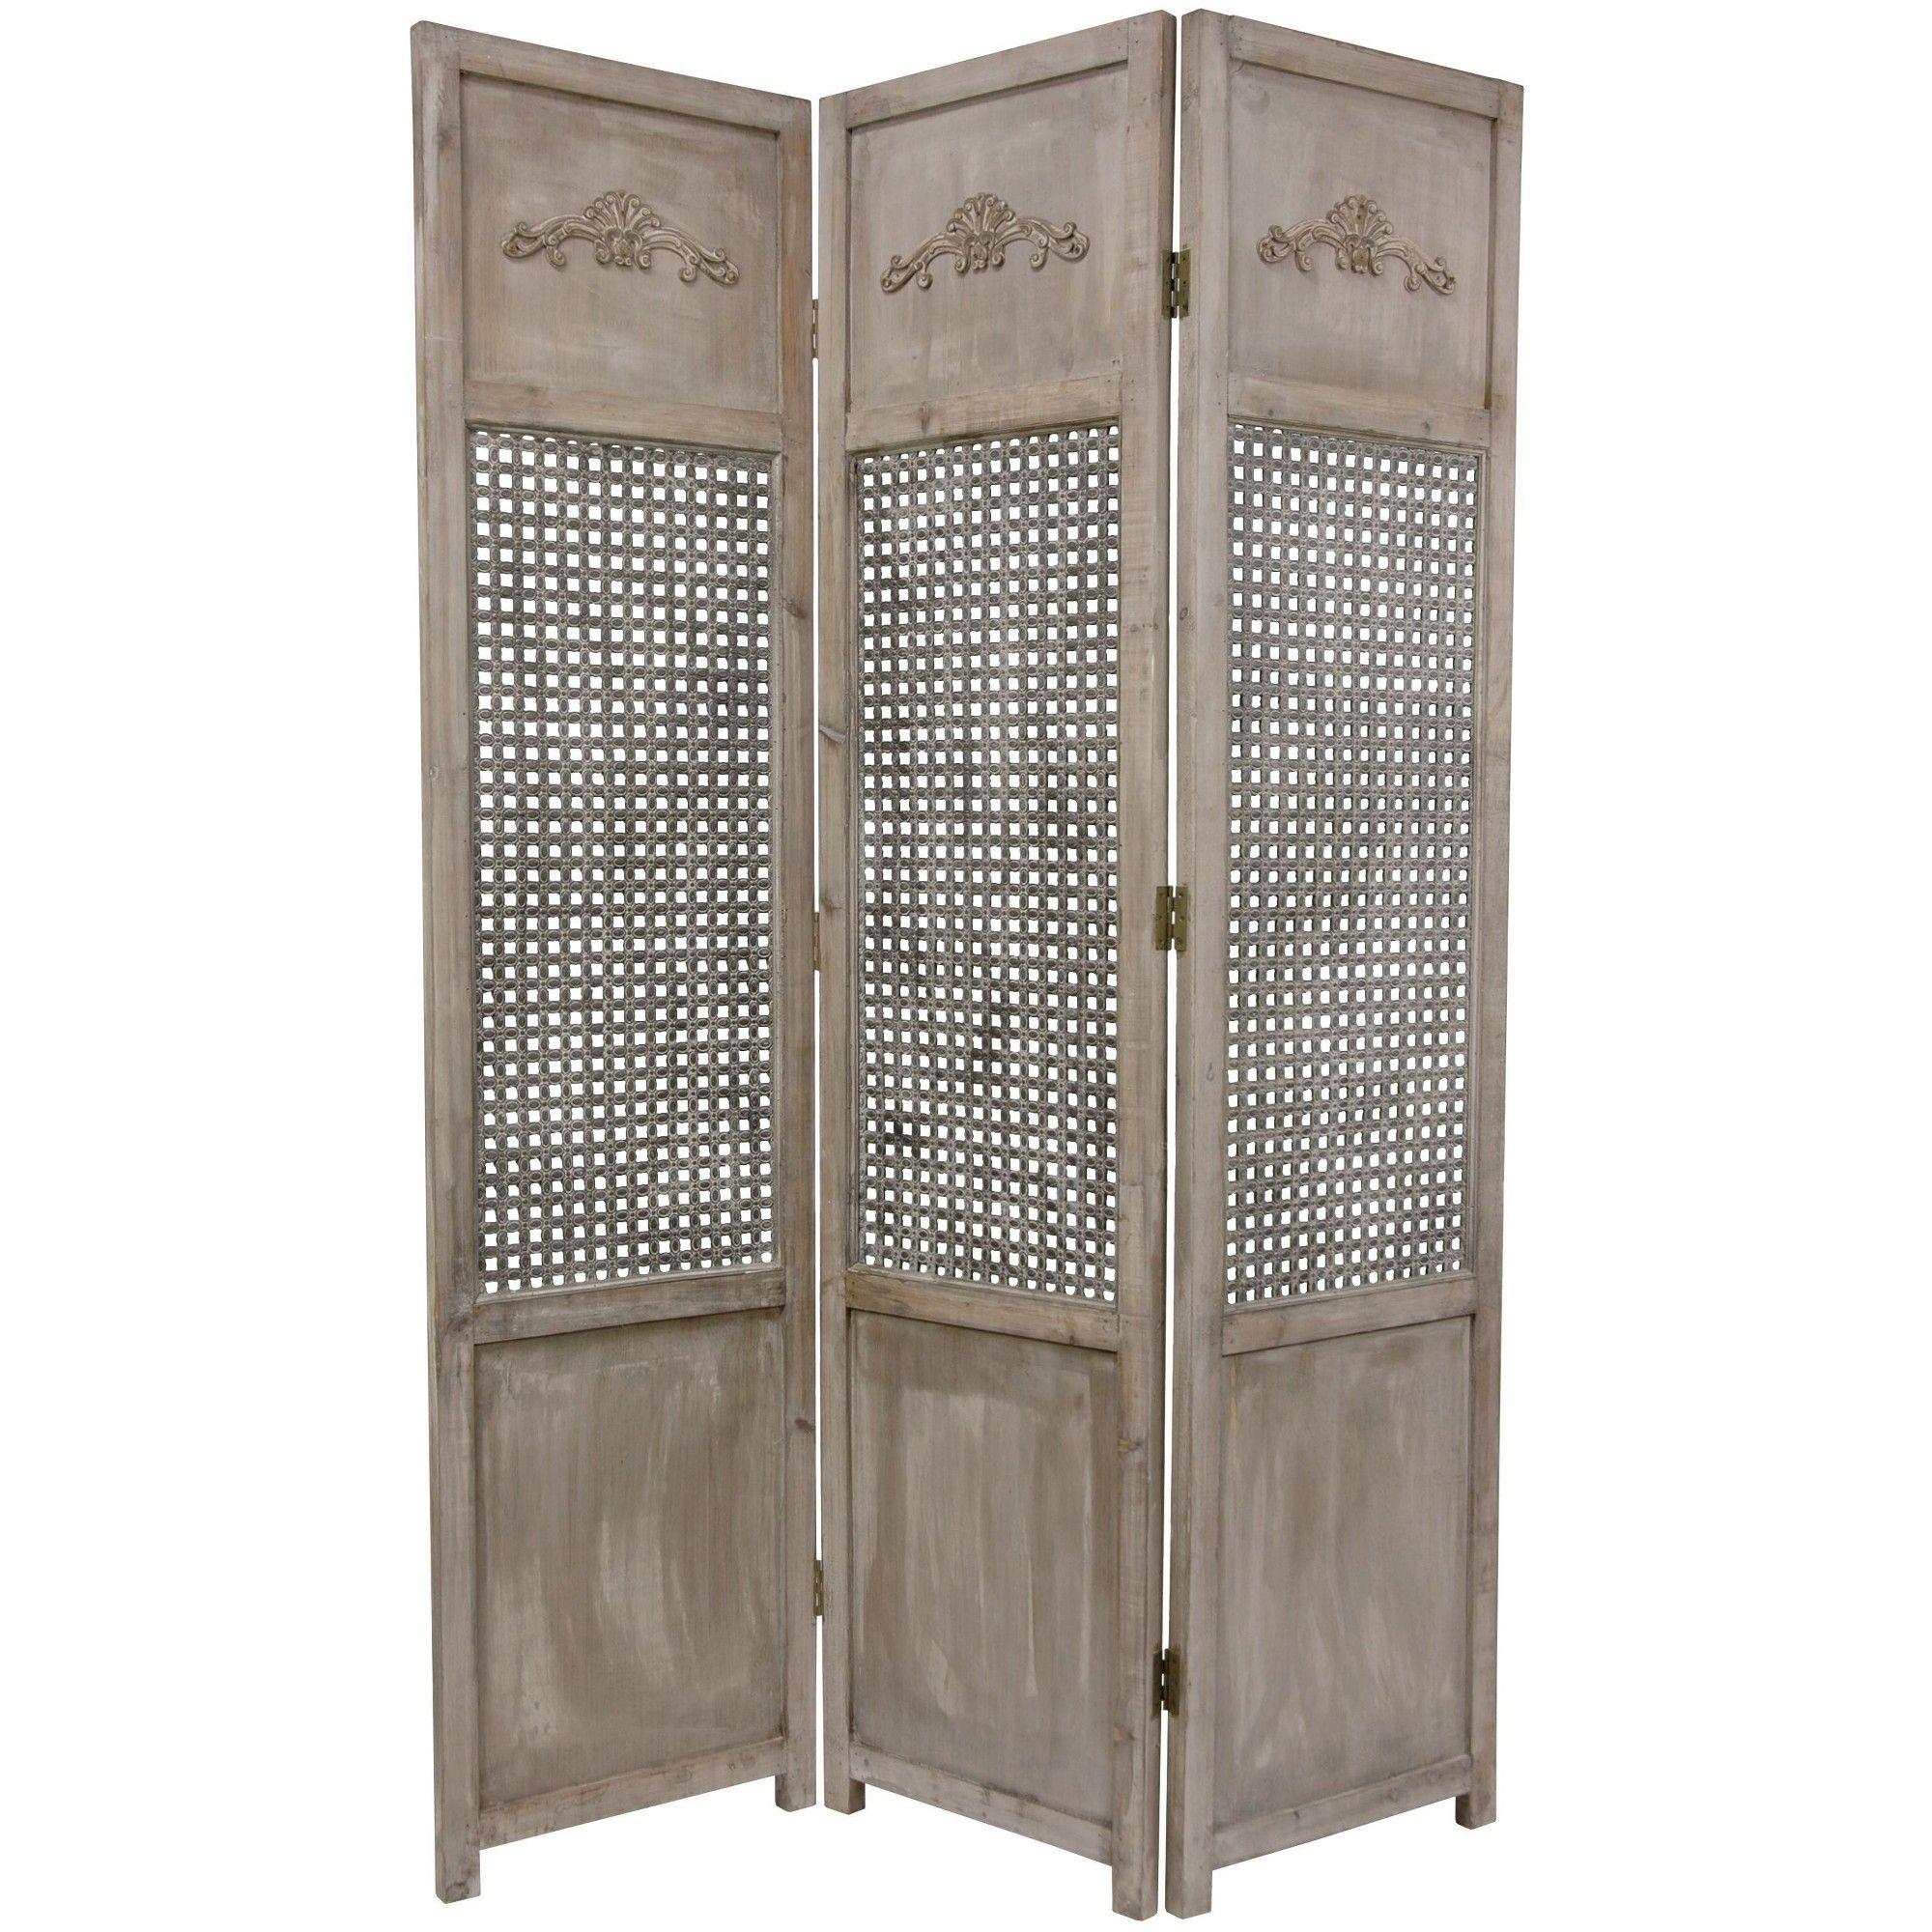 6 Tall Open Mesh Room Divider Oriental Furniture Gray